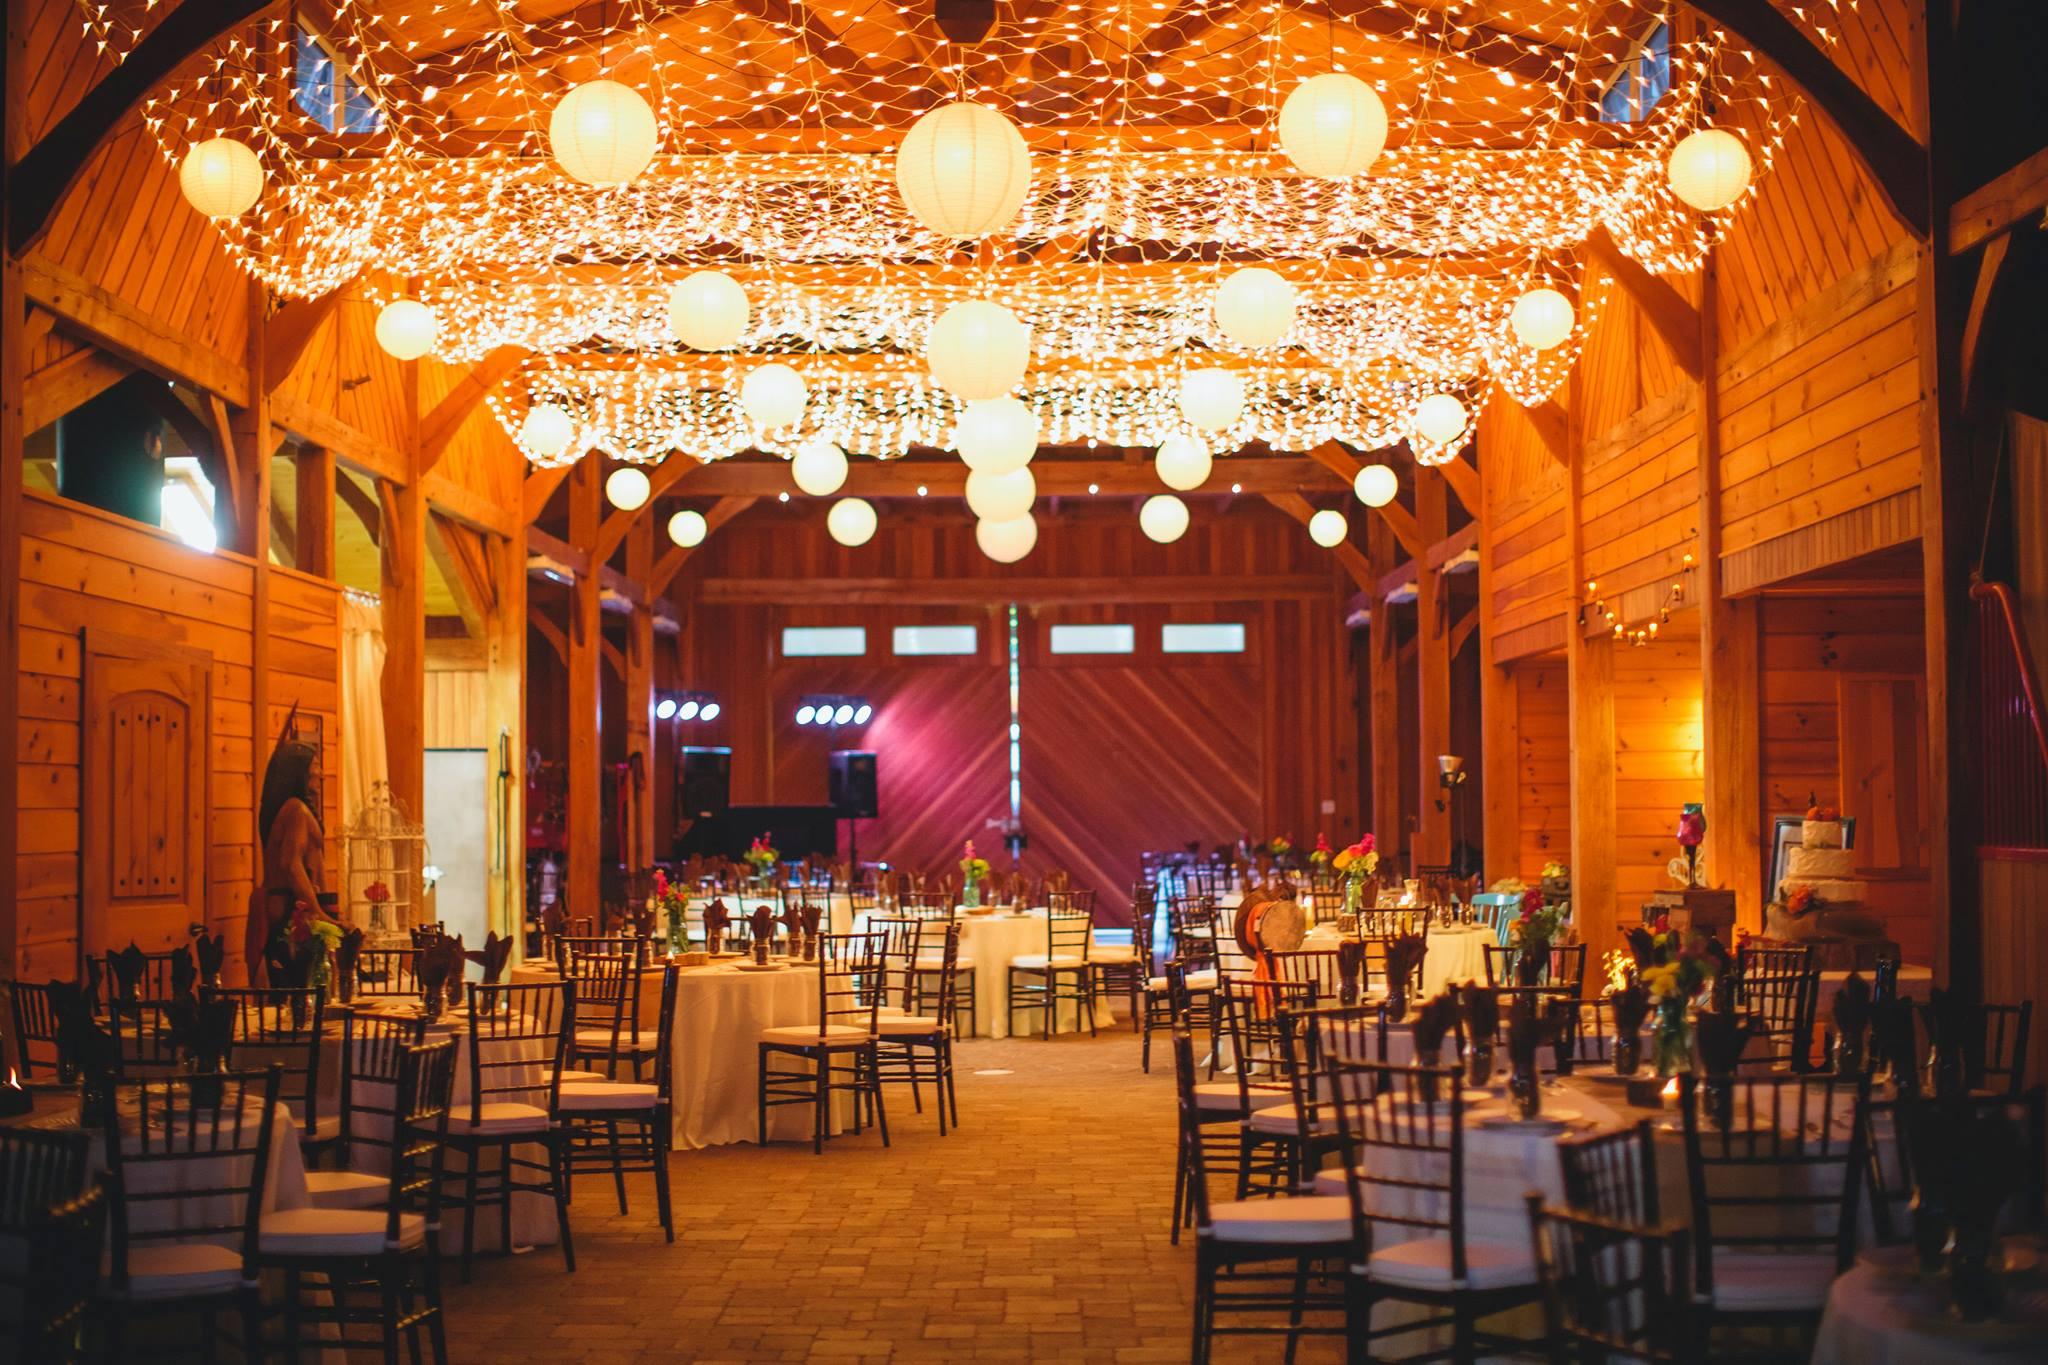 Barn Wedding Venue Lights